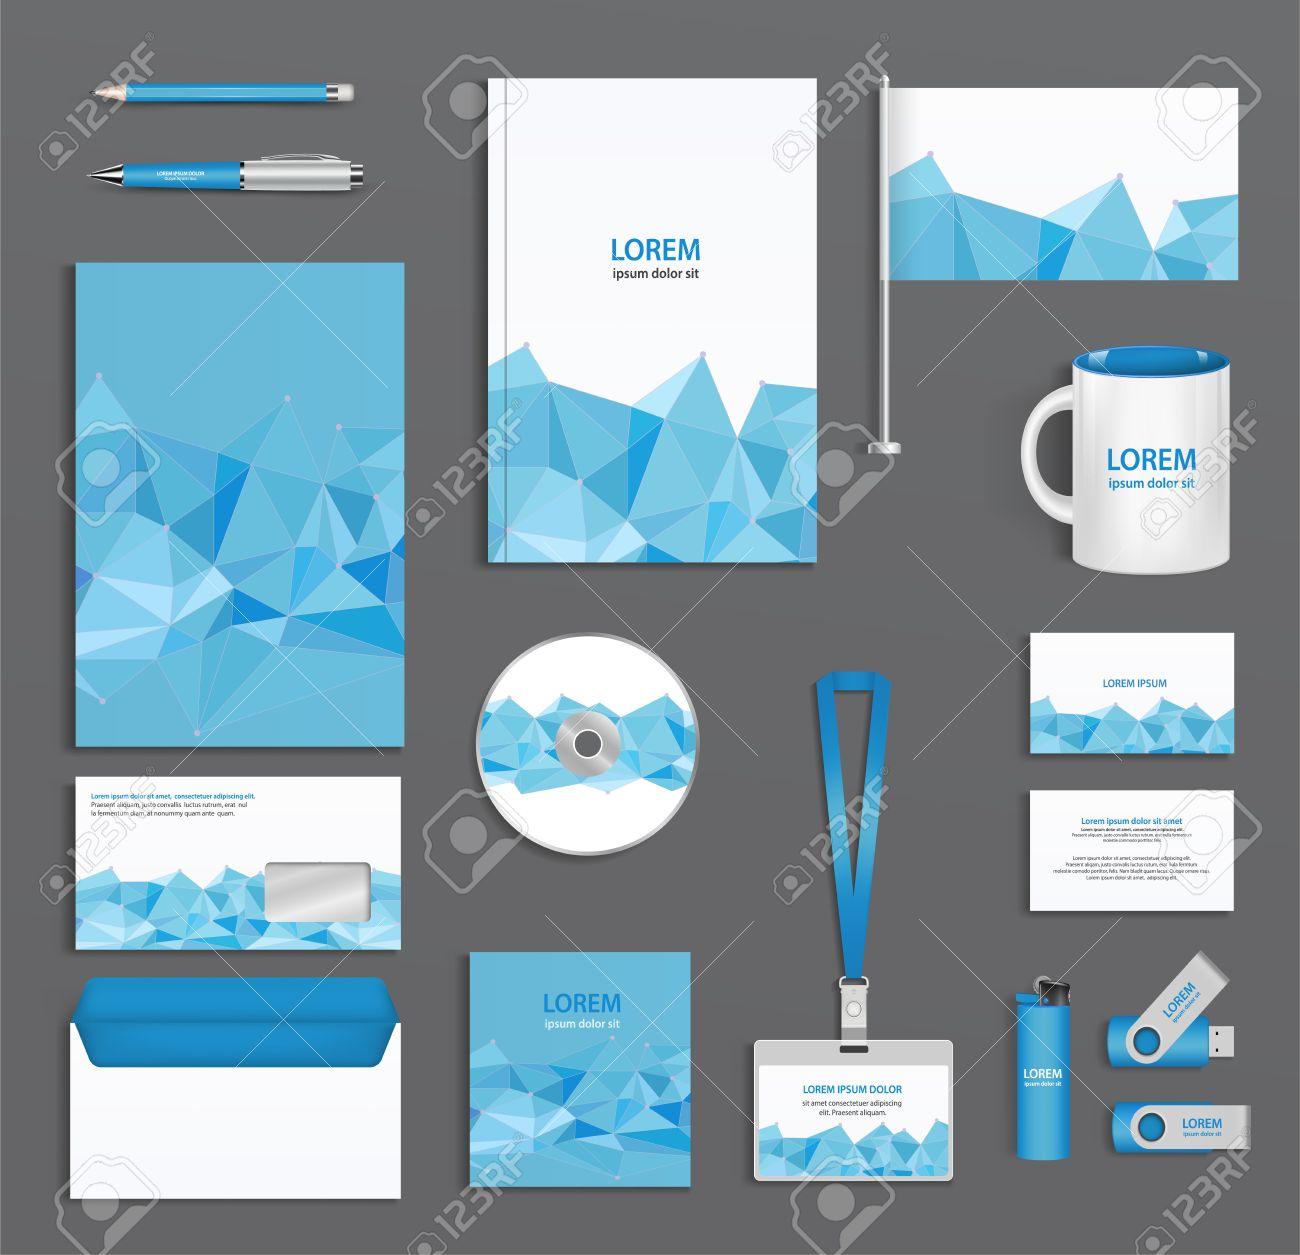 Nice Company Id Template Photos >> Employee Id Card Templates Daway ...